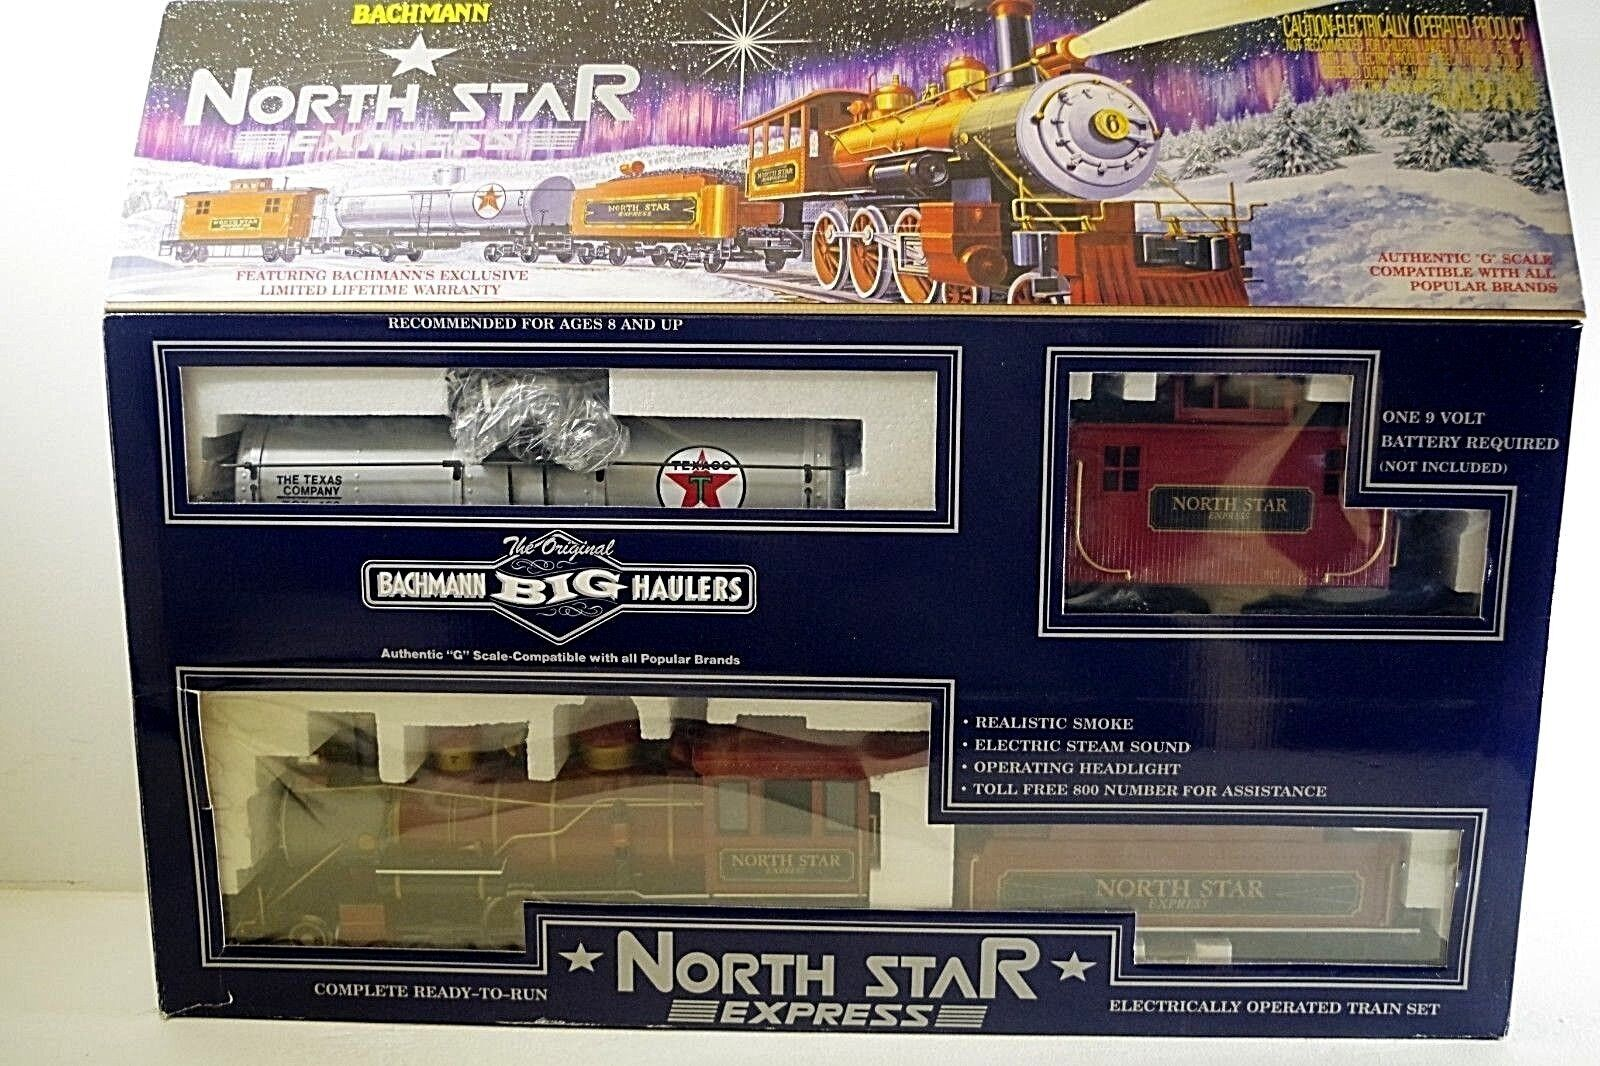 BACHMANN NORTH STAR EXPRESS 90018 TRAIN SET G SCALE MIB